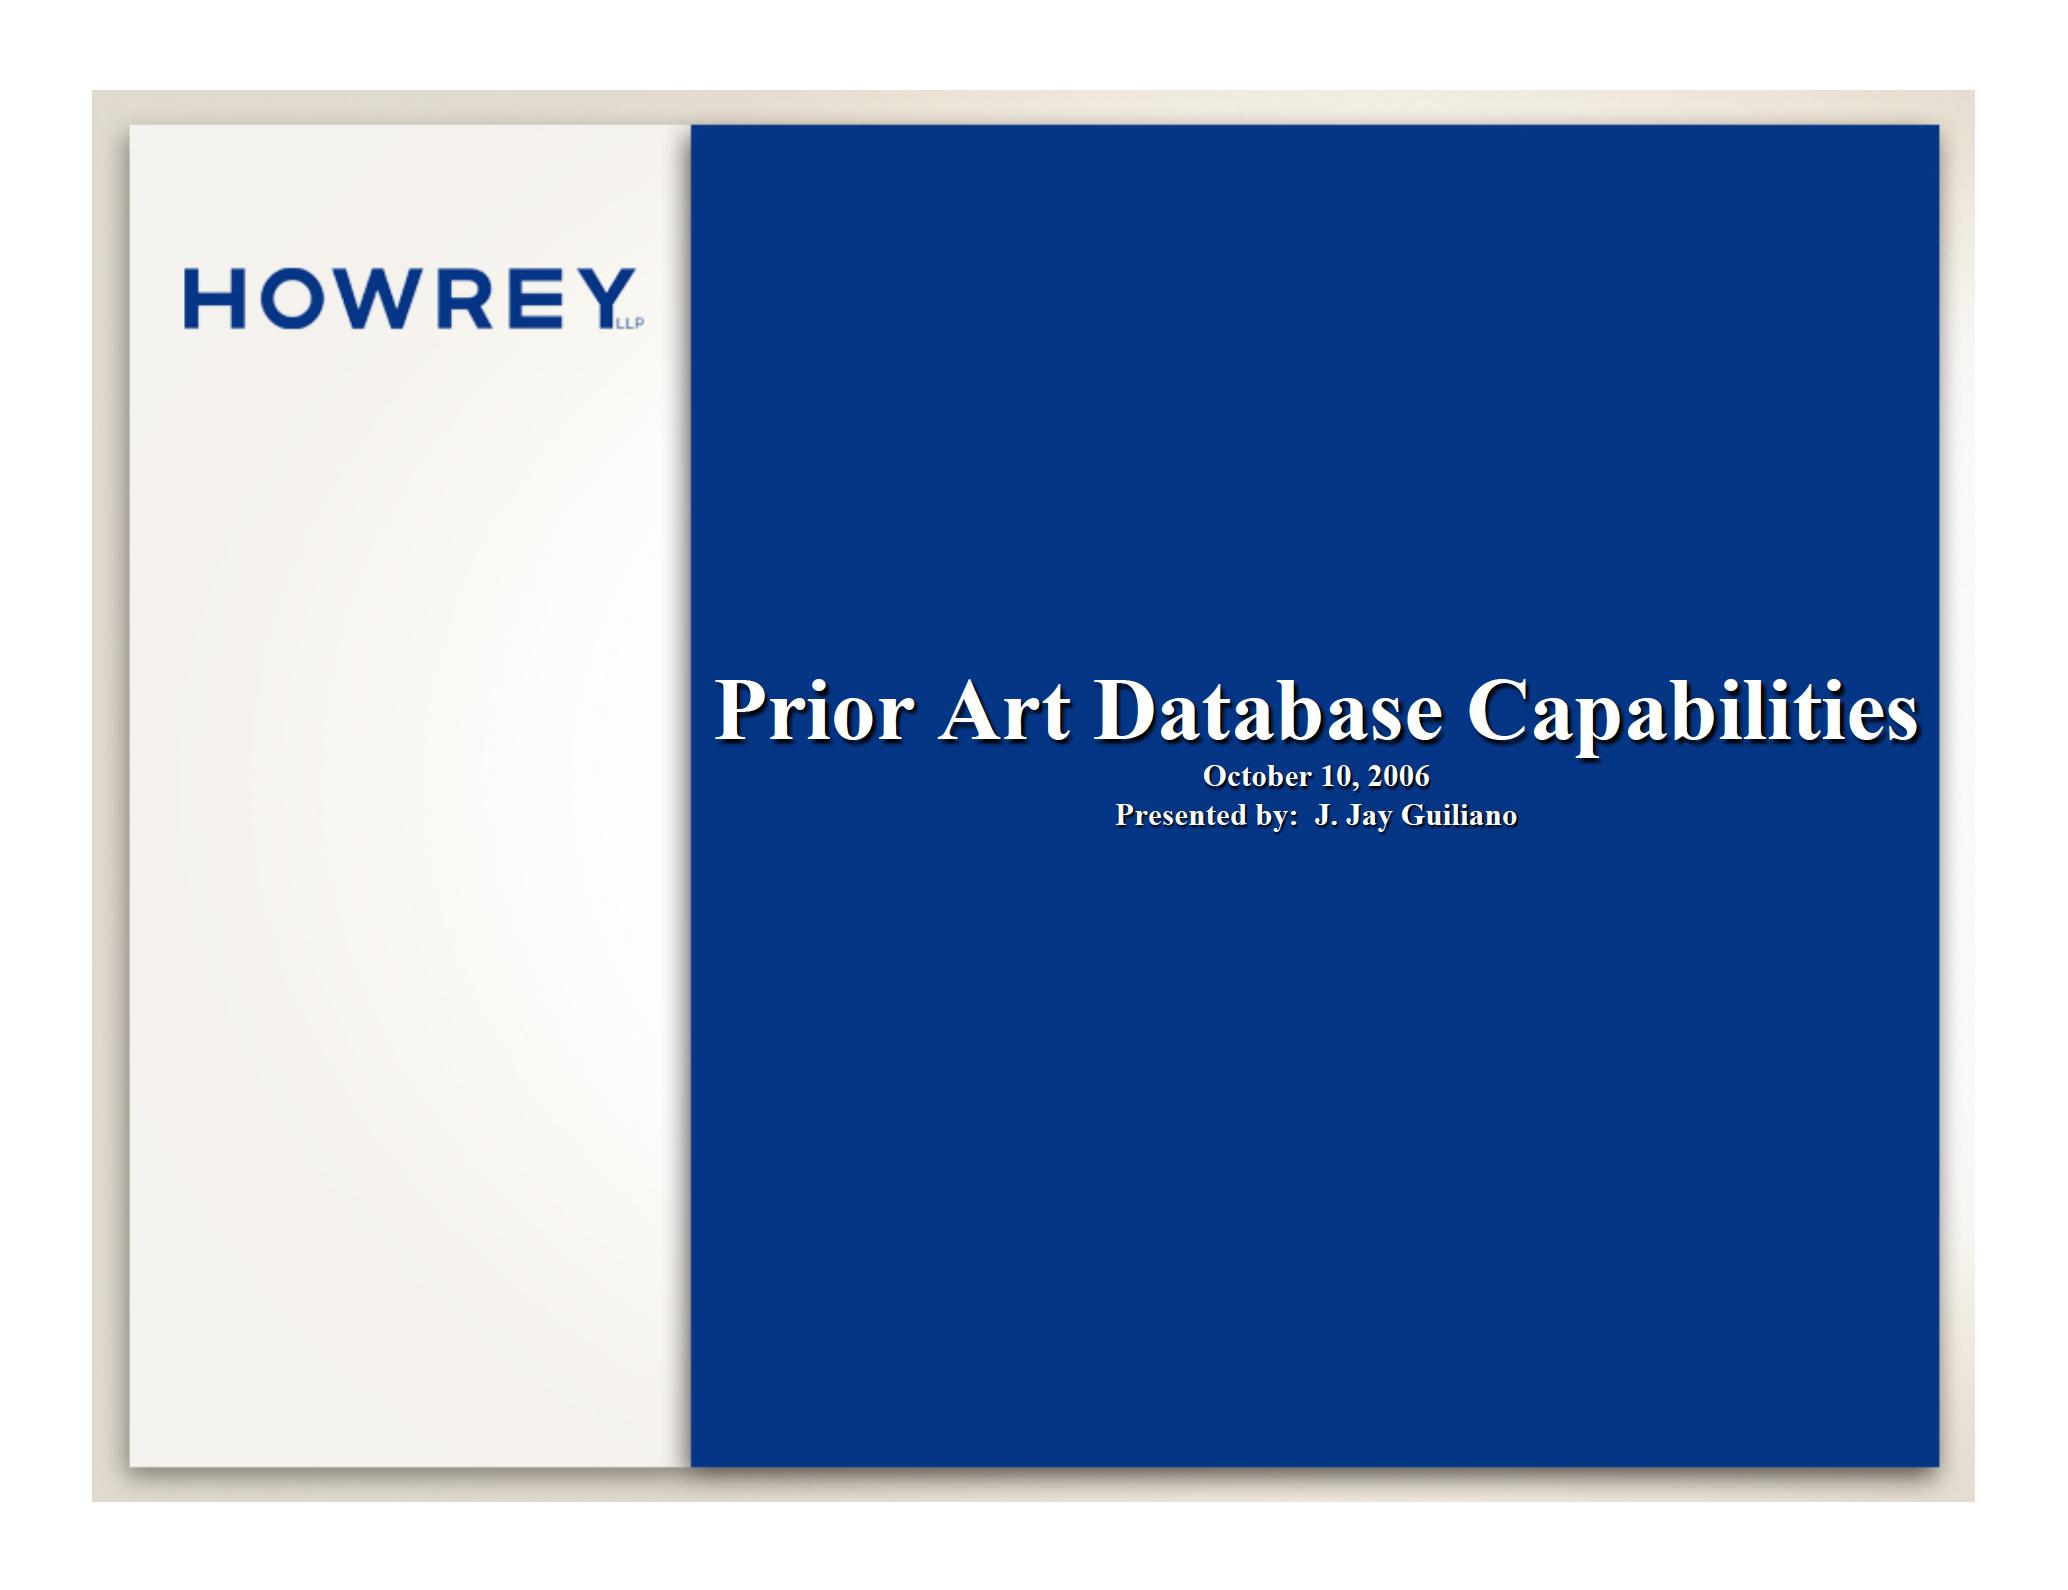 2006-oct-prior-art-database-capabilities.png